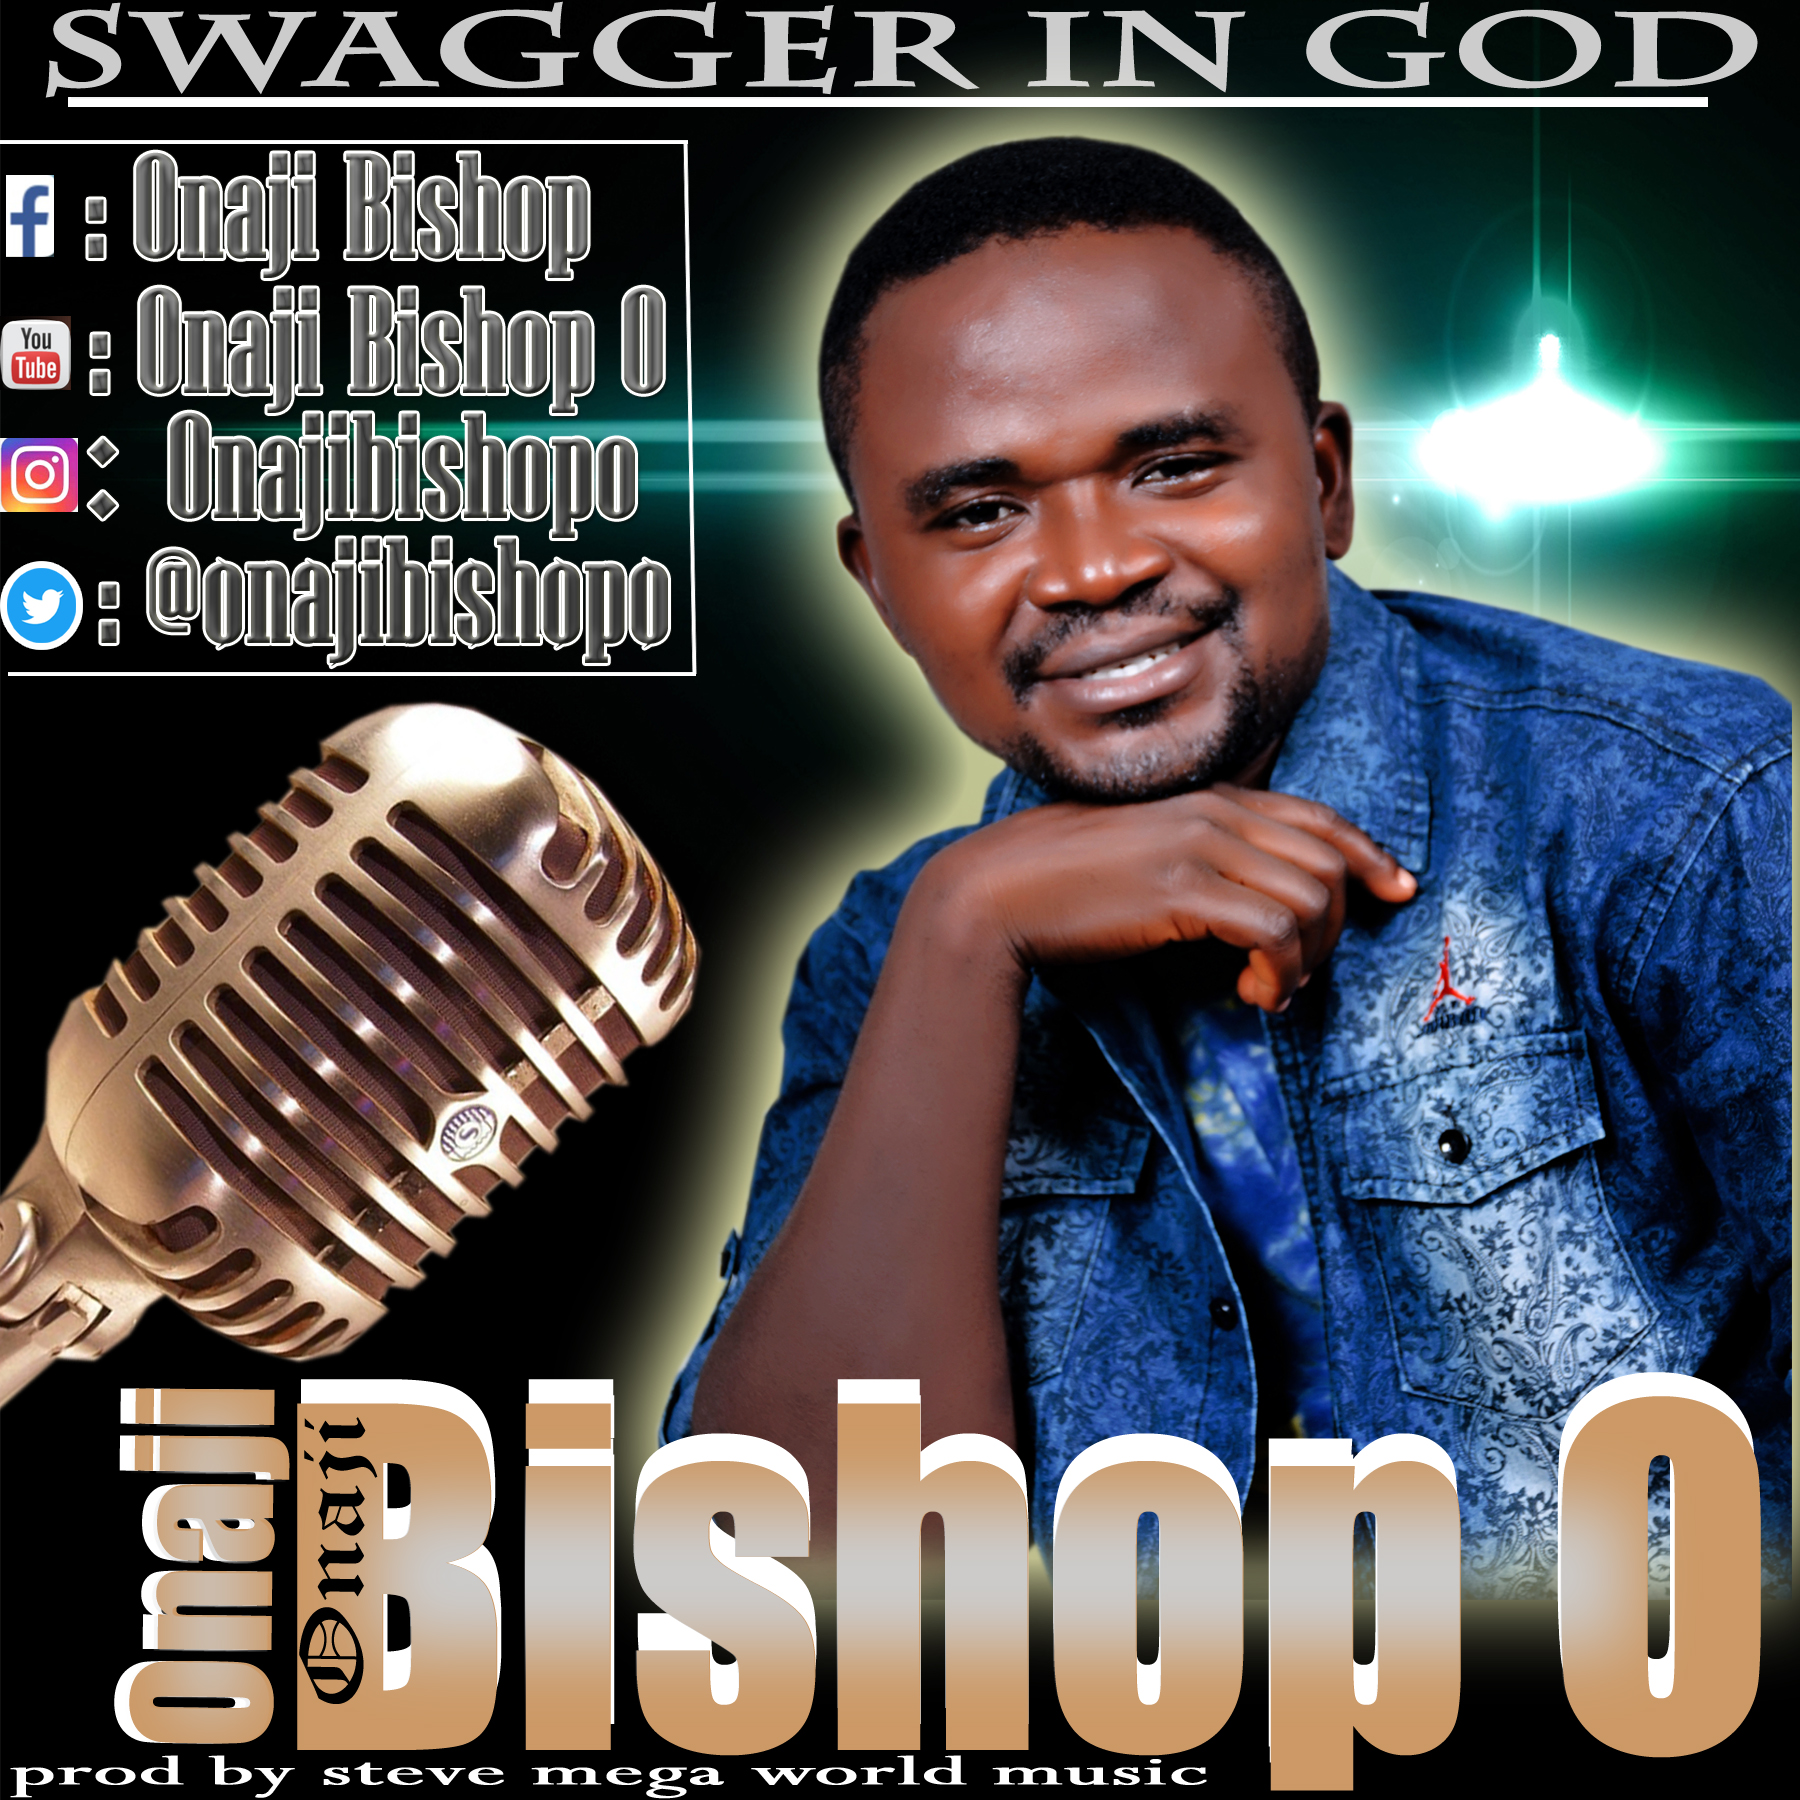 SWAGGER IN GOD - Onaji Bishop O.